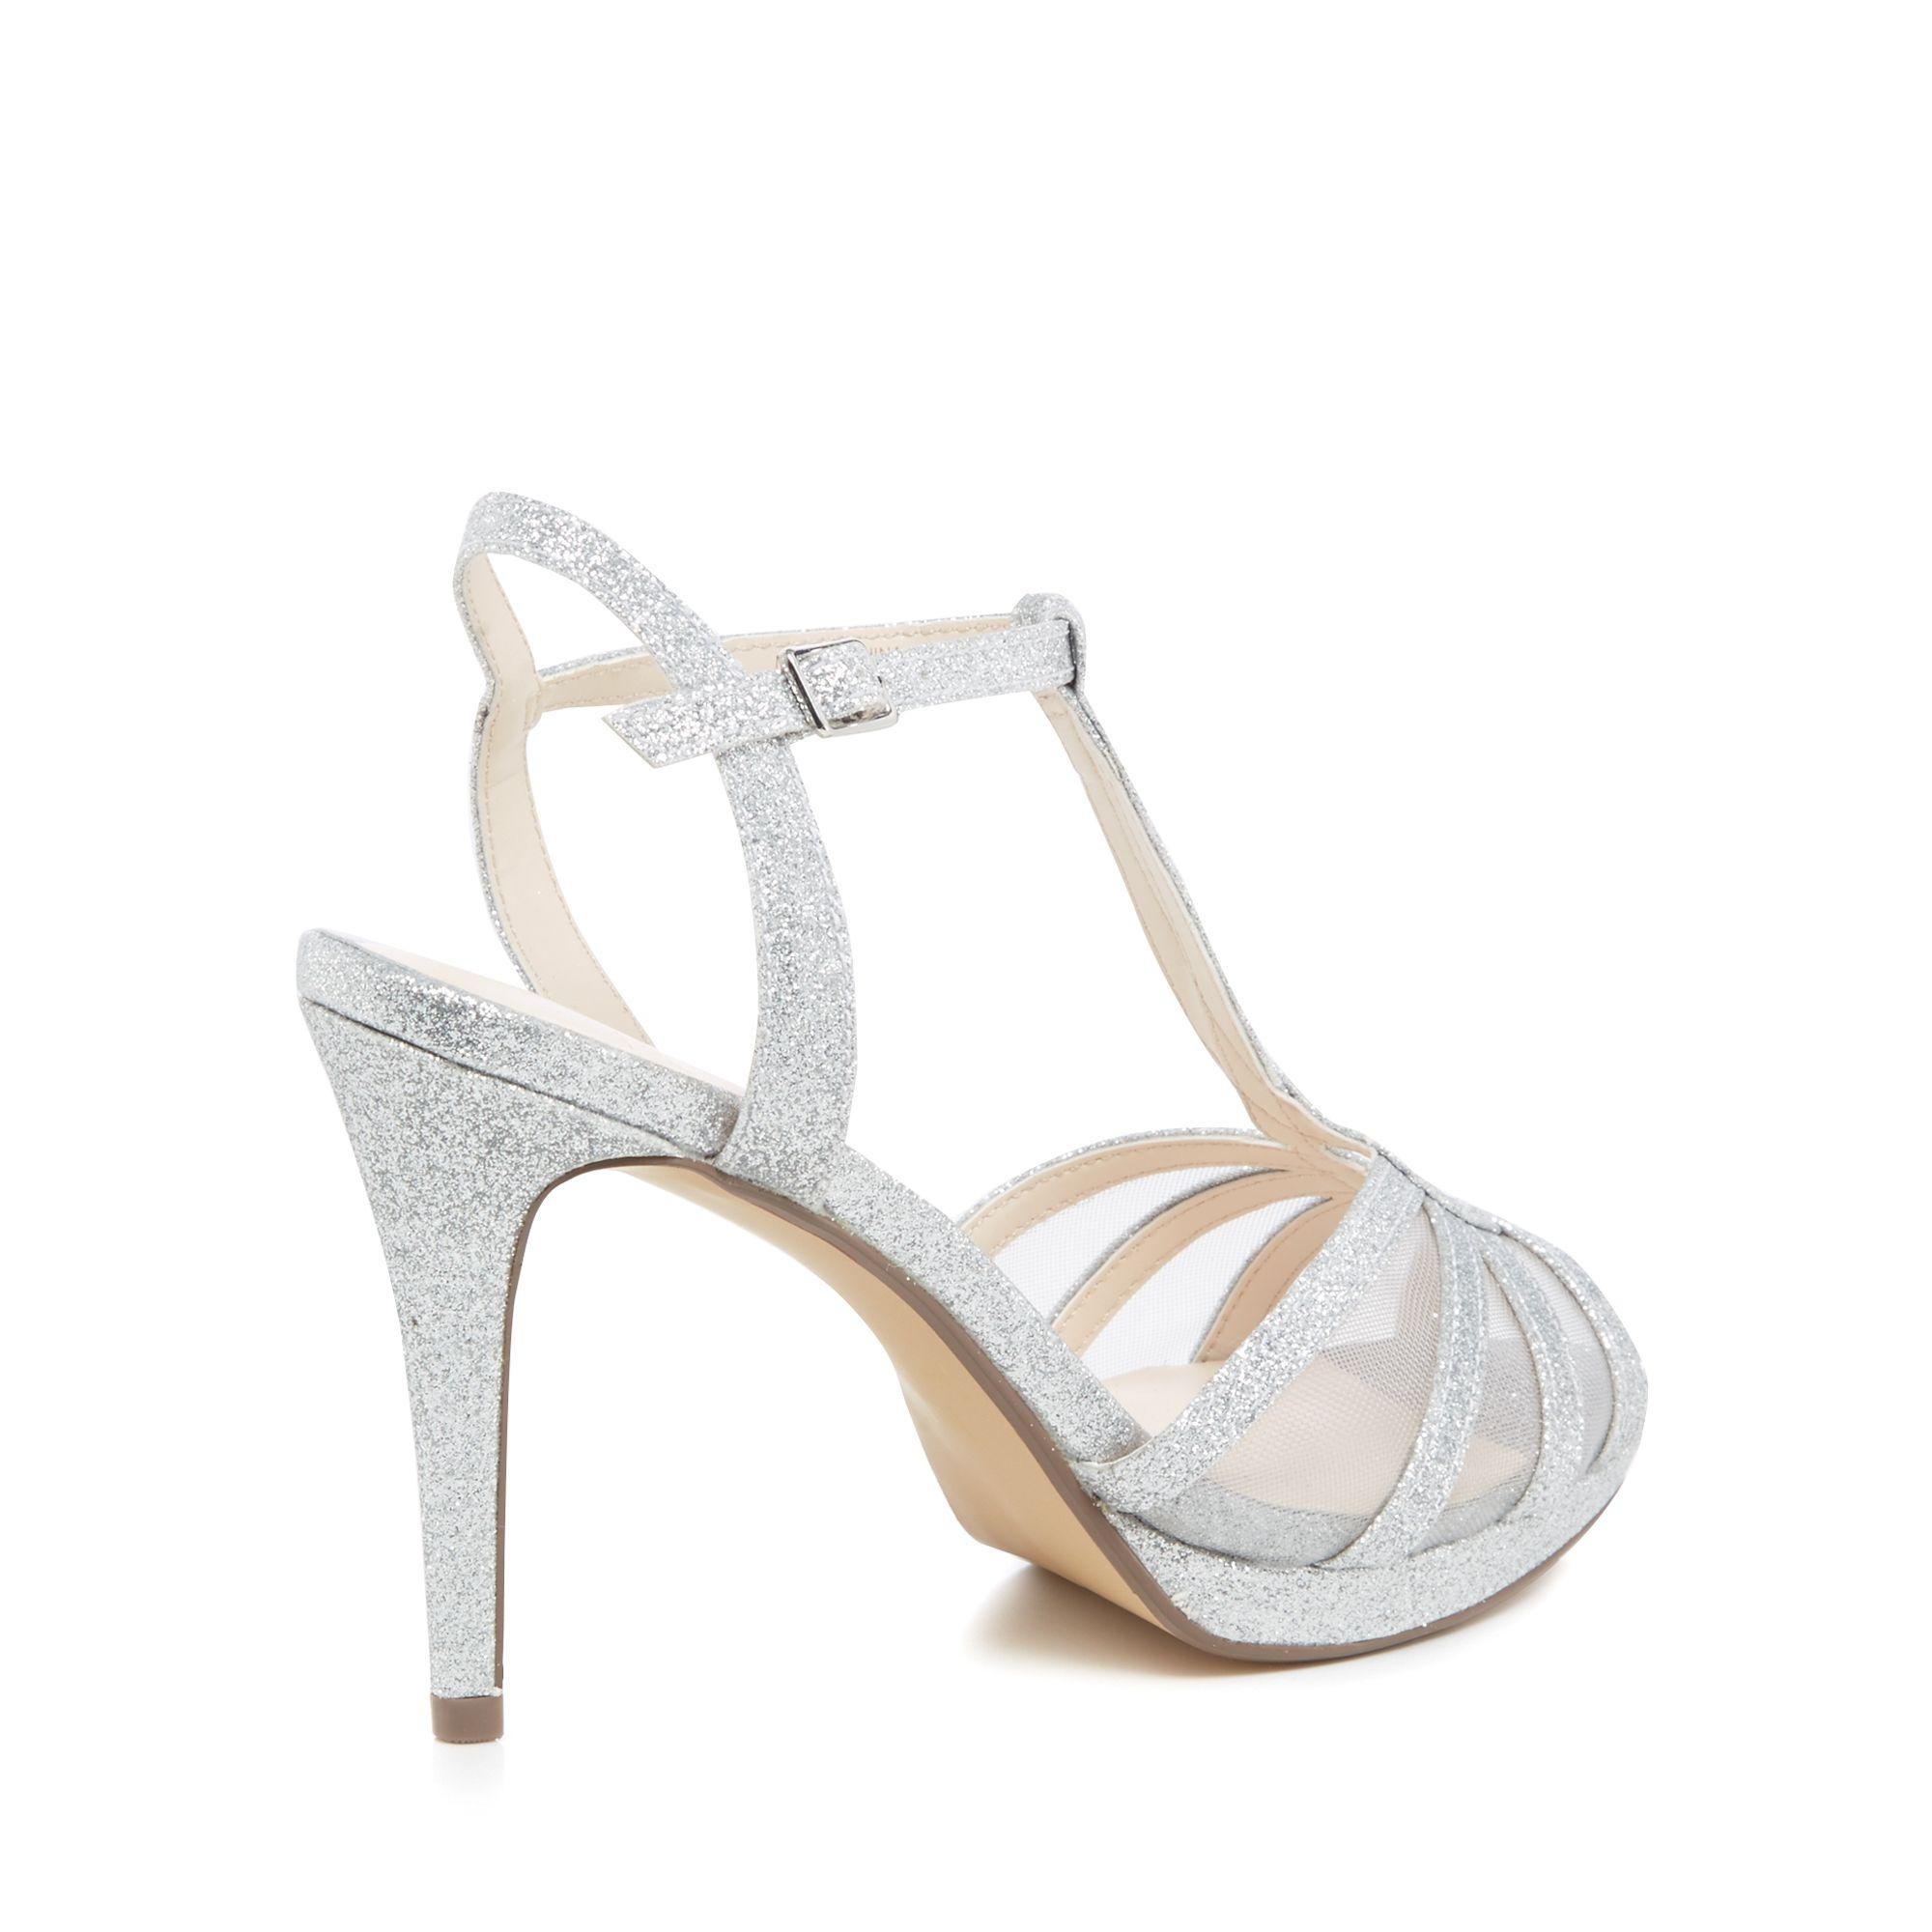 7e176dfaba1 Jenny Packham Silver Glitter  paradise  High Stiletto Heel T-bar ...